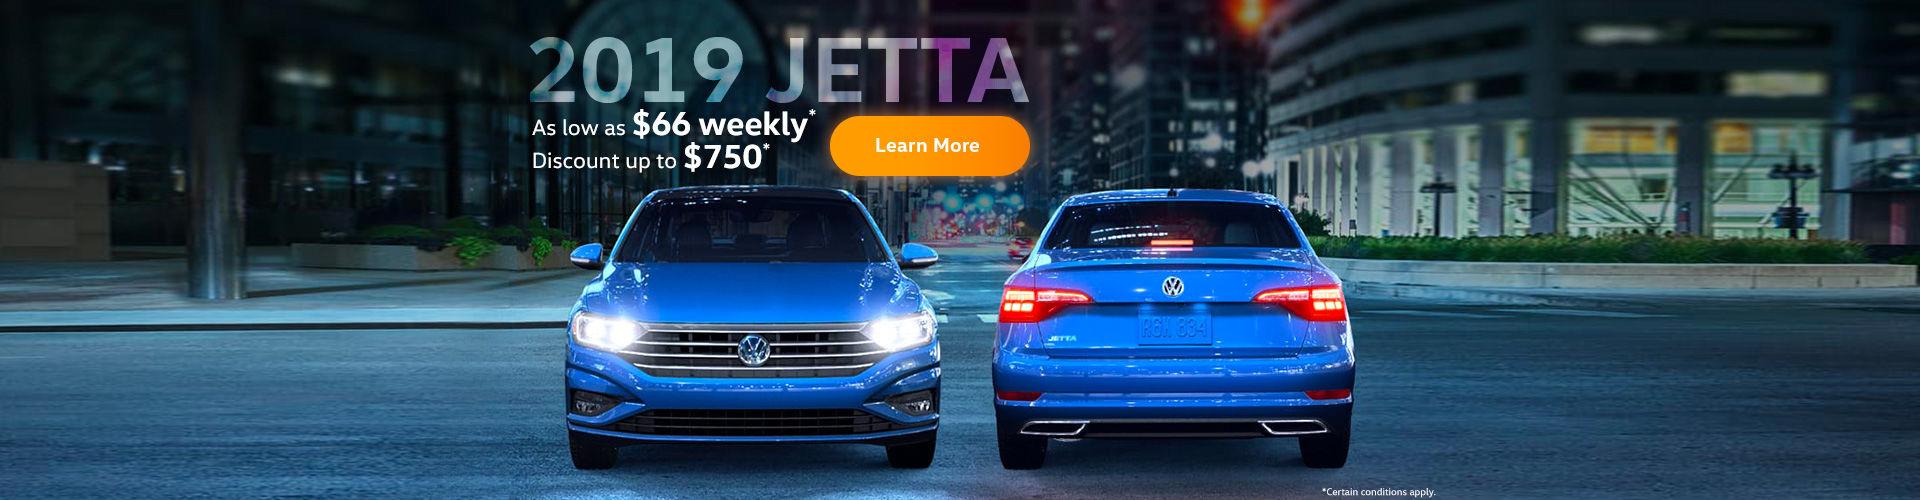 2019 jetta - $66 weekly